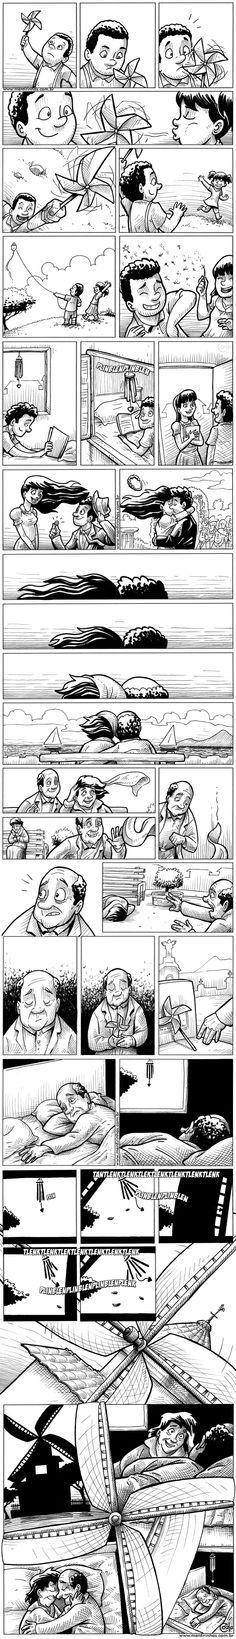 FunSubstance - Funny pics, memes and trending stories Sad Comics, Comics Story, Short Comics, Cute Comics, Cute Stories, Short Stories, Beautiful Stories, Feeling Sad, Faith In Humanity